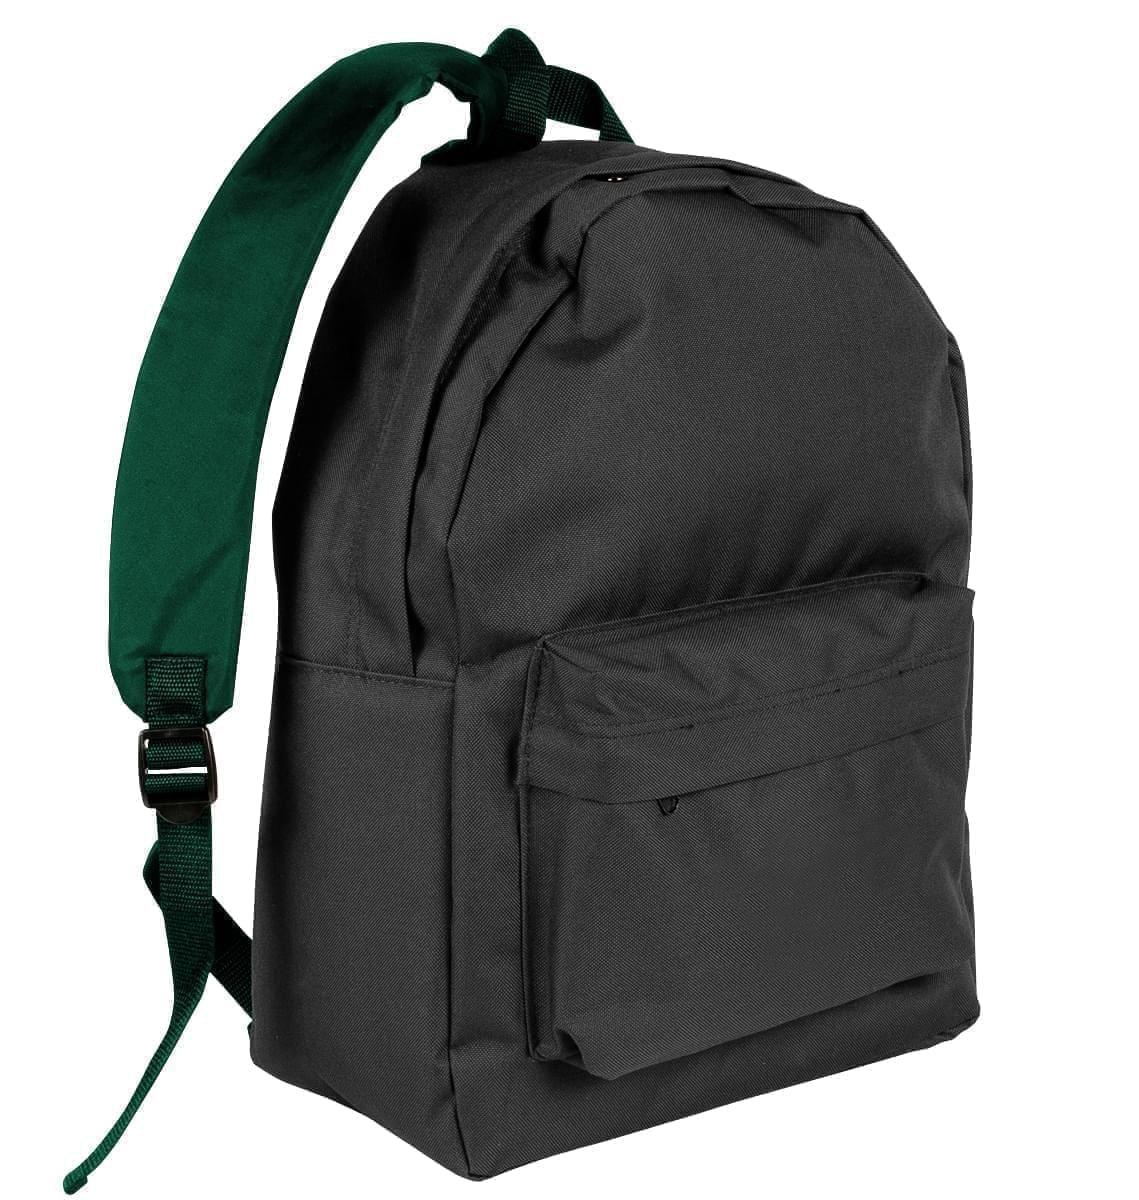 USA Made Nylon Poly Backpack Knapsacks, Black-Hunter Green, 8960-AOV